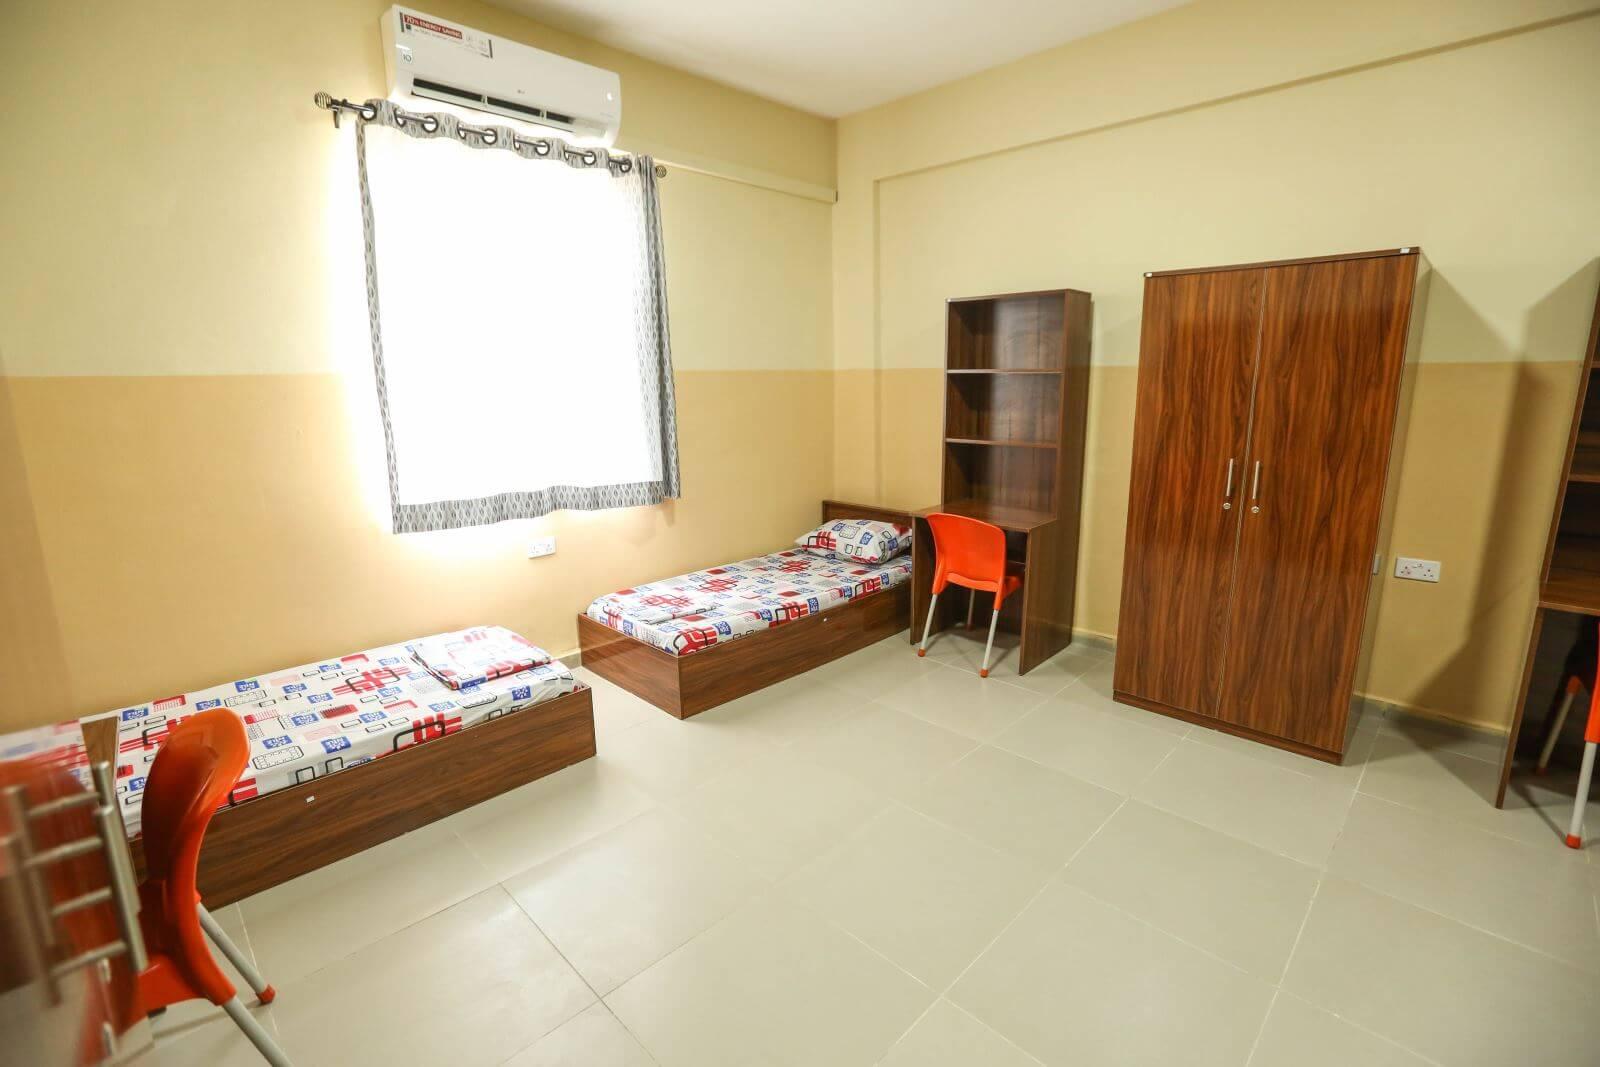 hostel-accomodation 4